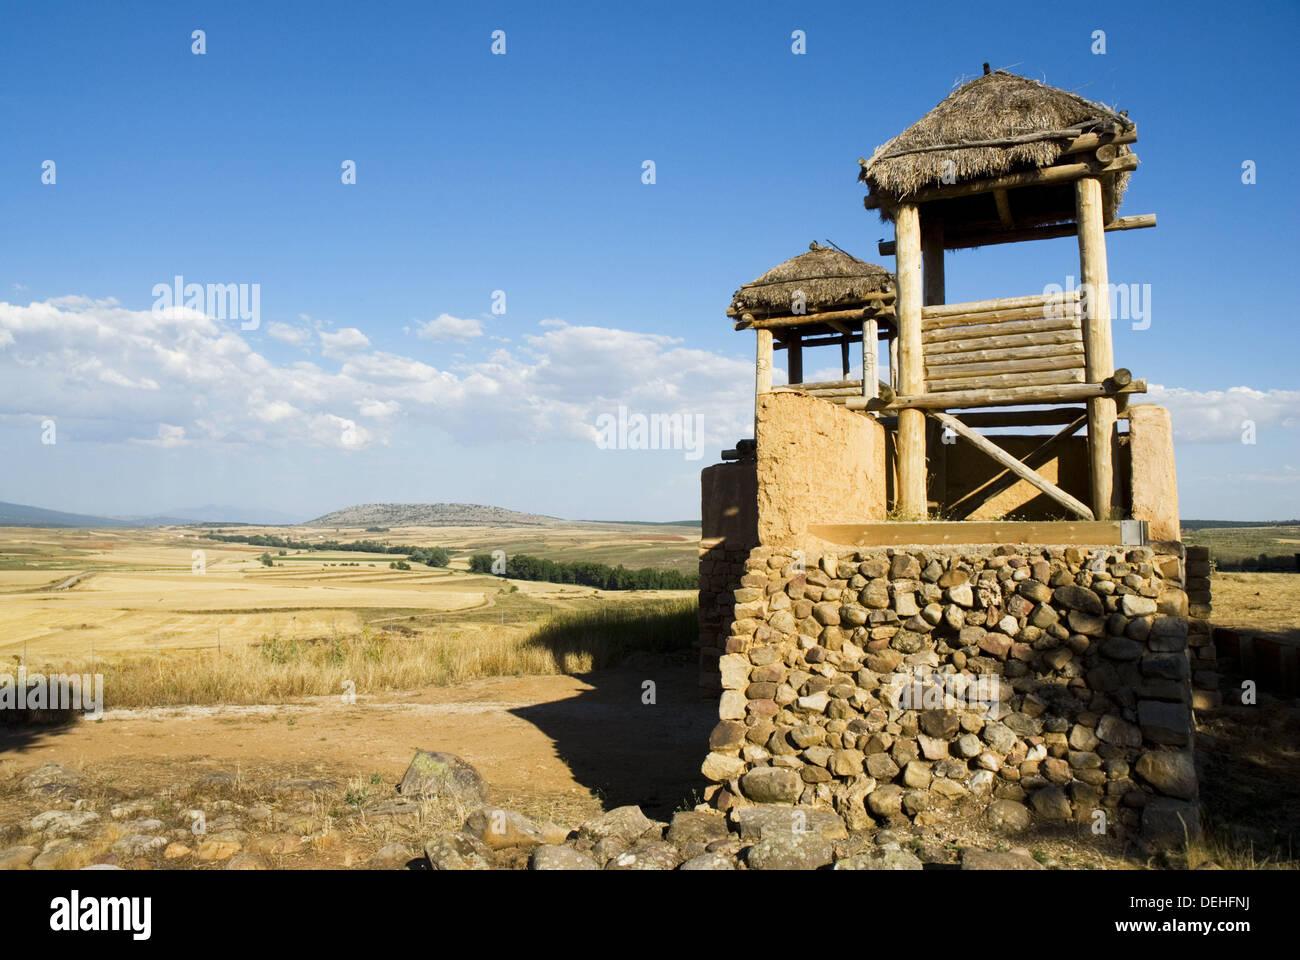 Reconstruction of the celtiberian wall, Numancia (Numantia) archaeological site. Near Garray, Soria province, Castile-Leon, - Stock Image